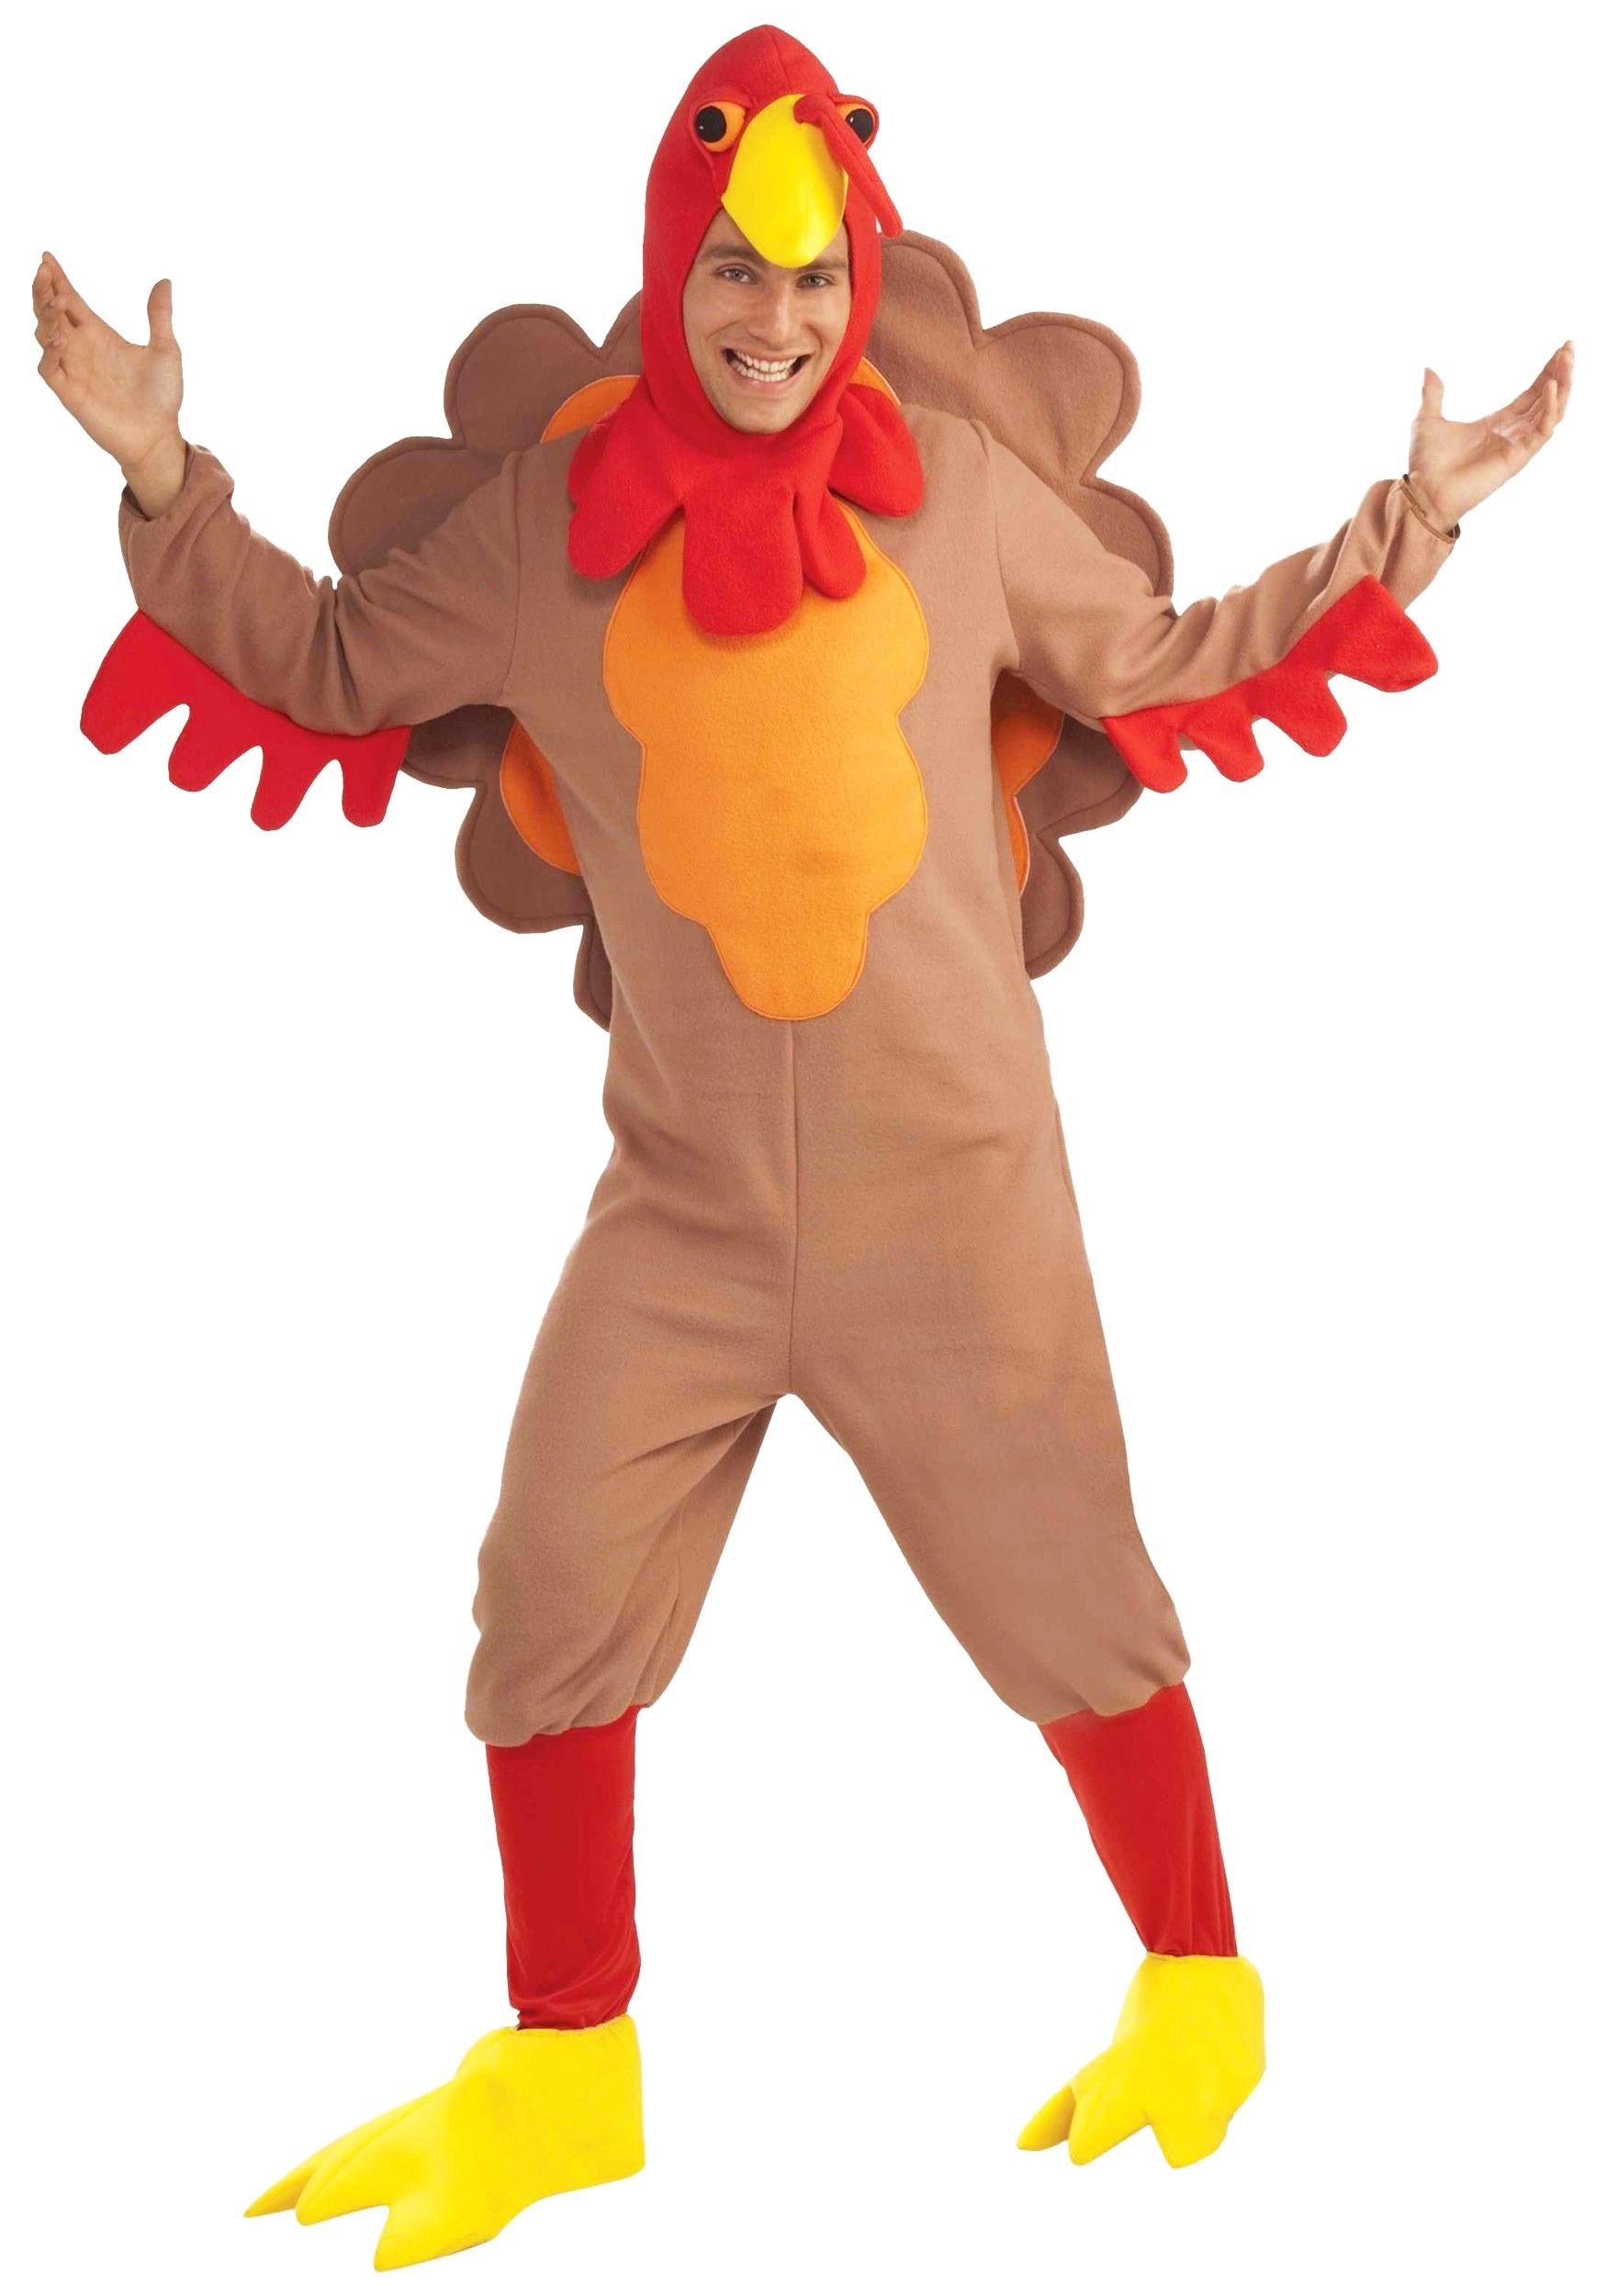 jive turkey close to thanksgiving